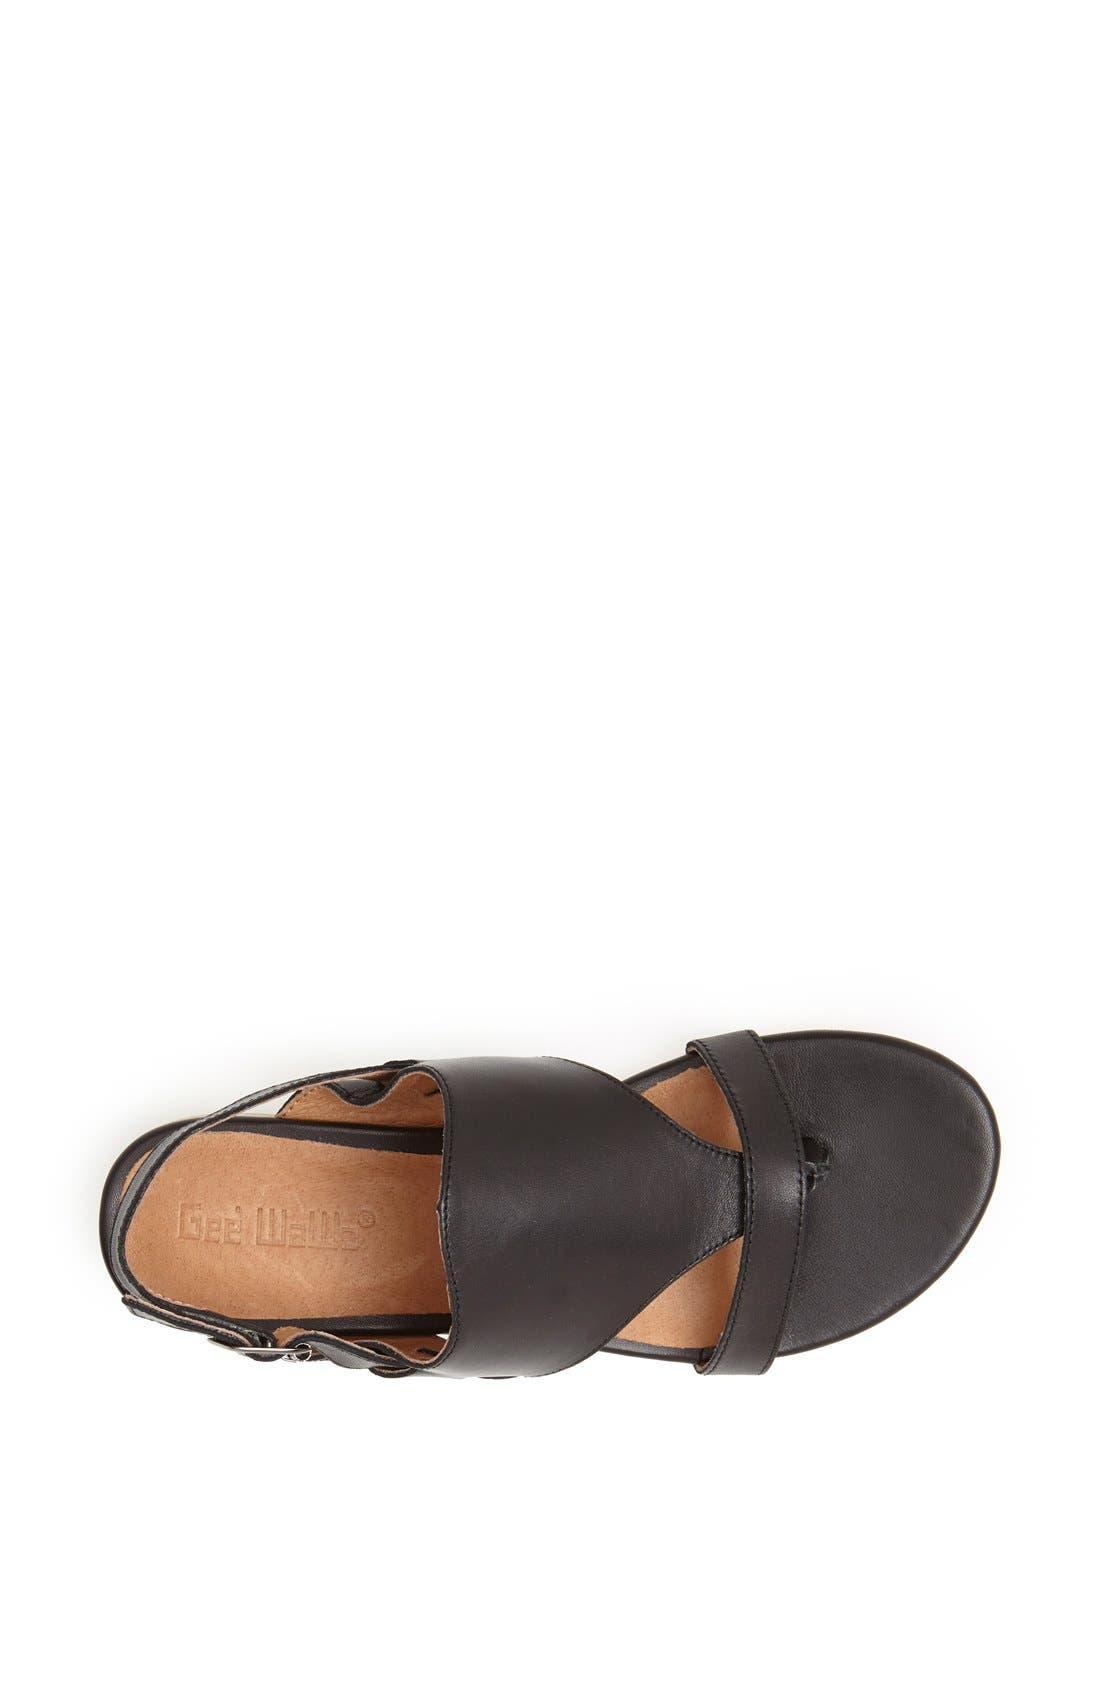 Alternate Image 3  - Gee WaWa 'Dany' Sandal